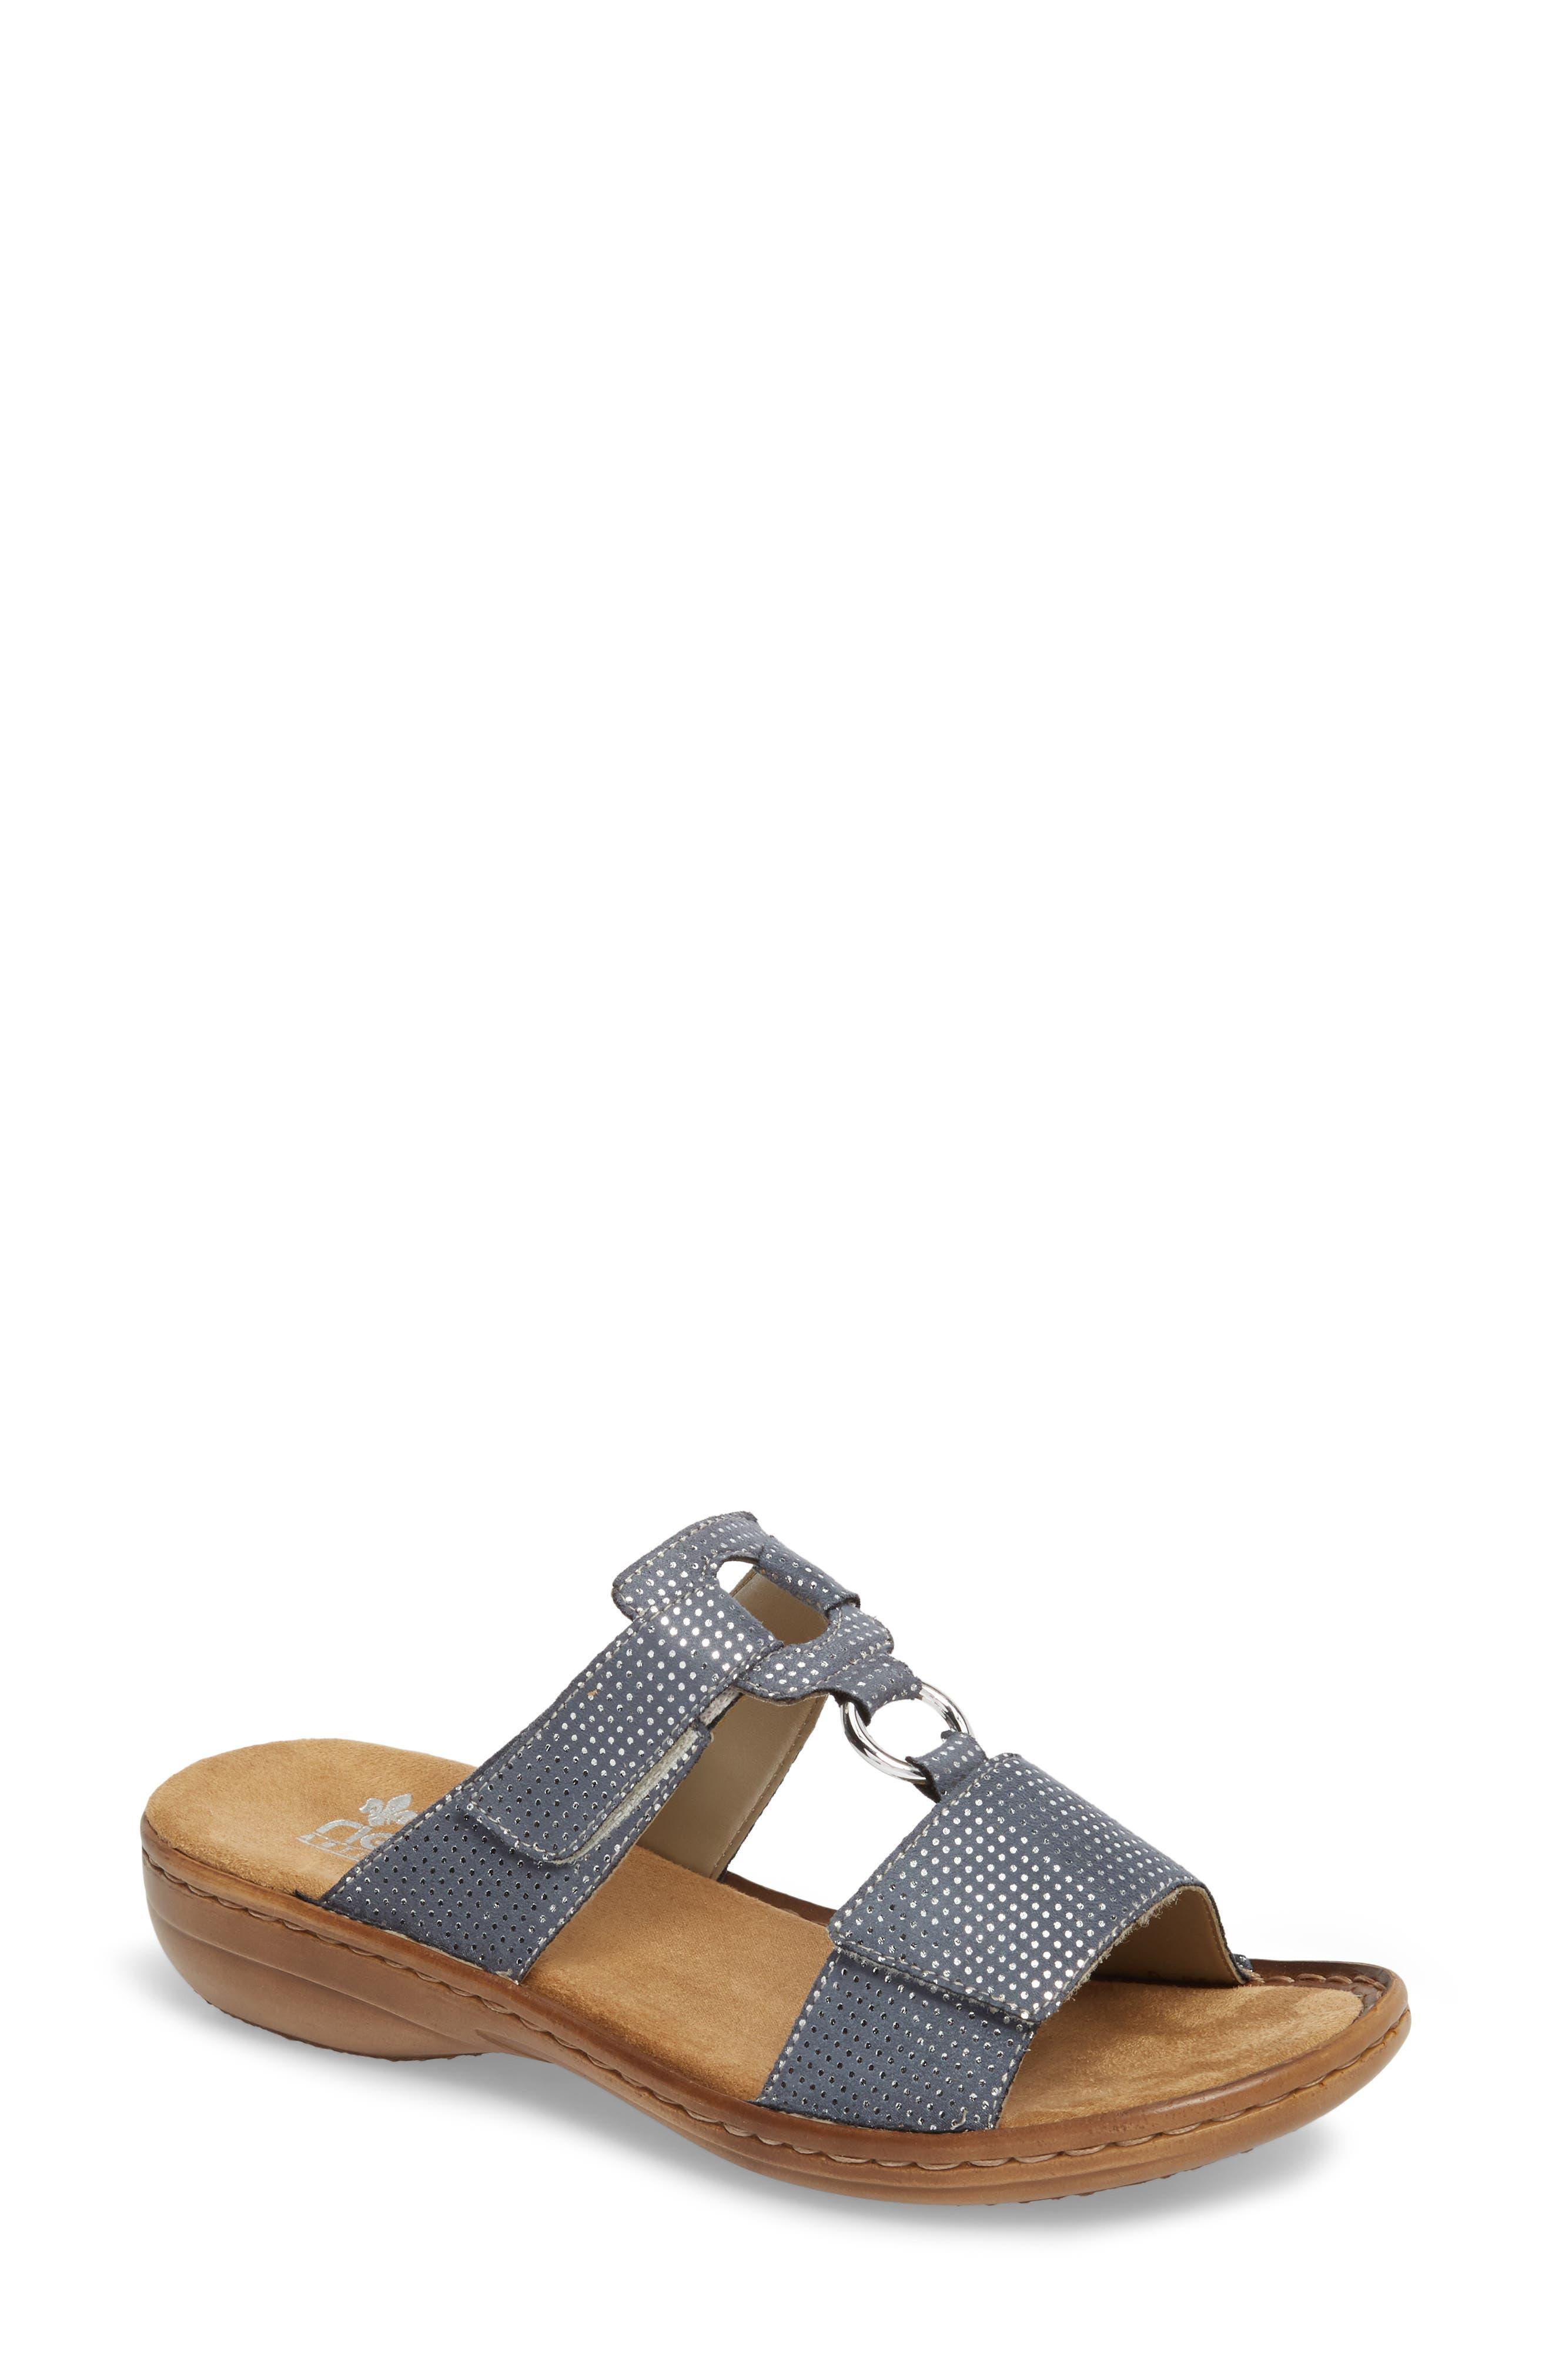 Regina P9 Slide Sandal,                             Main thumbnail 1, color,                             White Denim Fabric